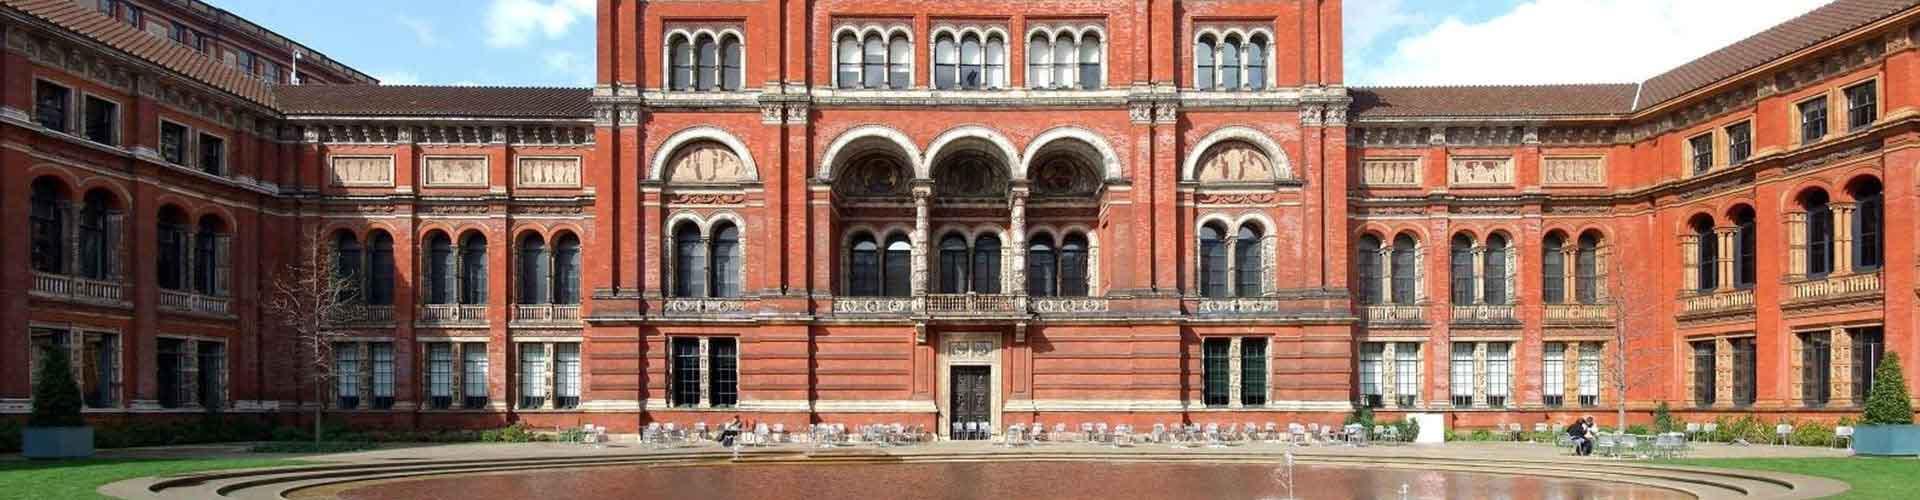 Londres - Albergues Juveniles cerca a Victoria and Albert Museum. Mapas de Londres, Fotos y Comentarios para cada Albergue Juvenil en Londres.